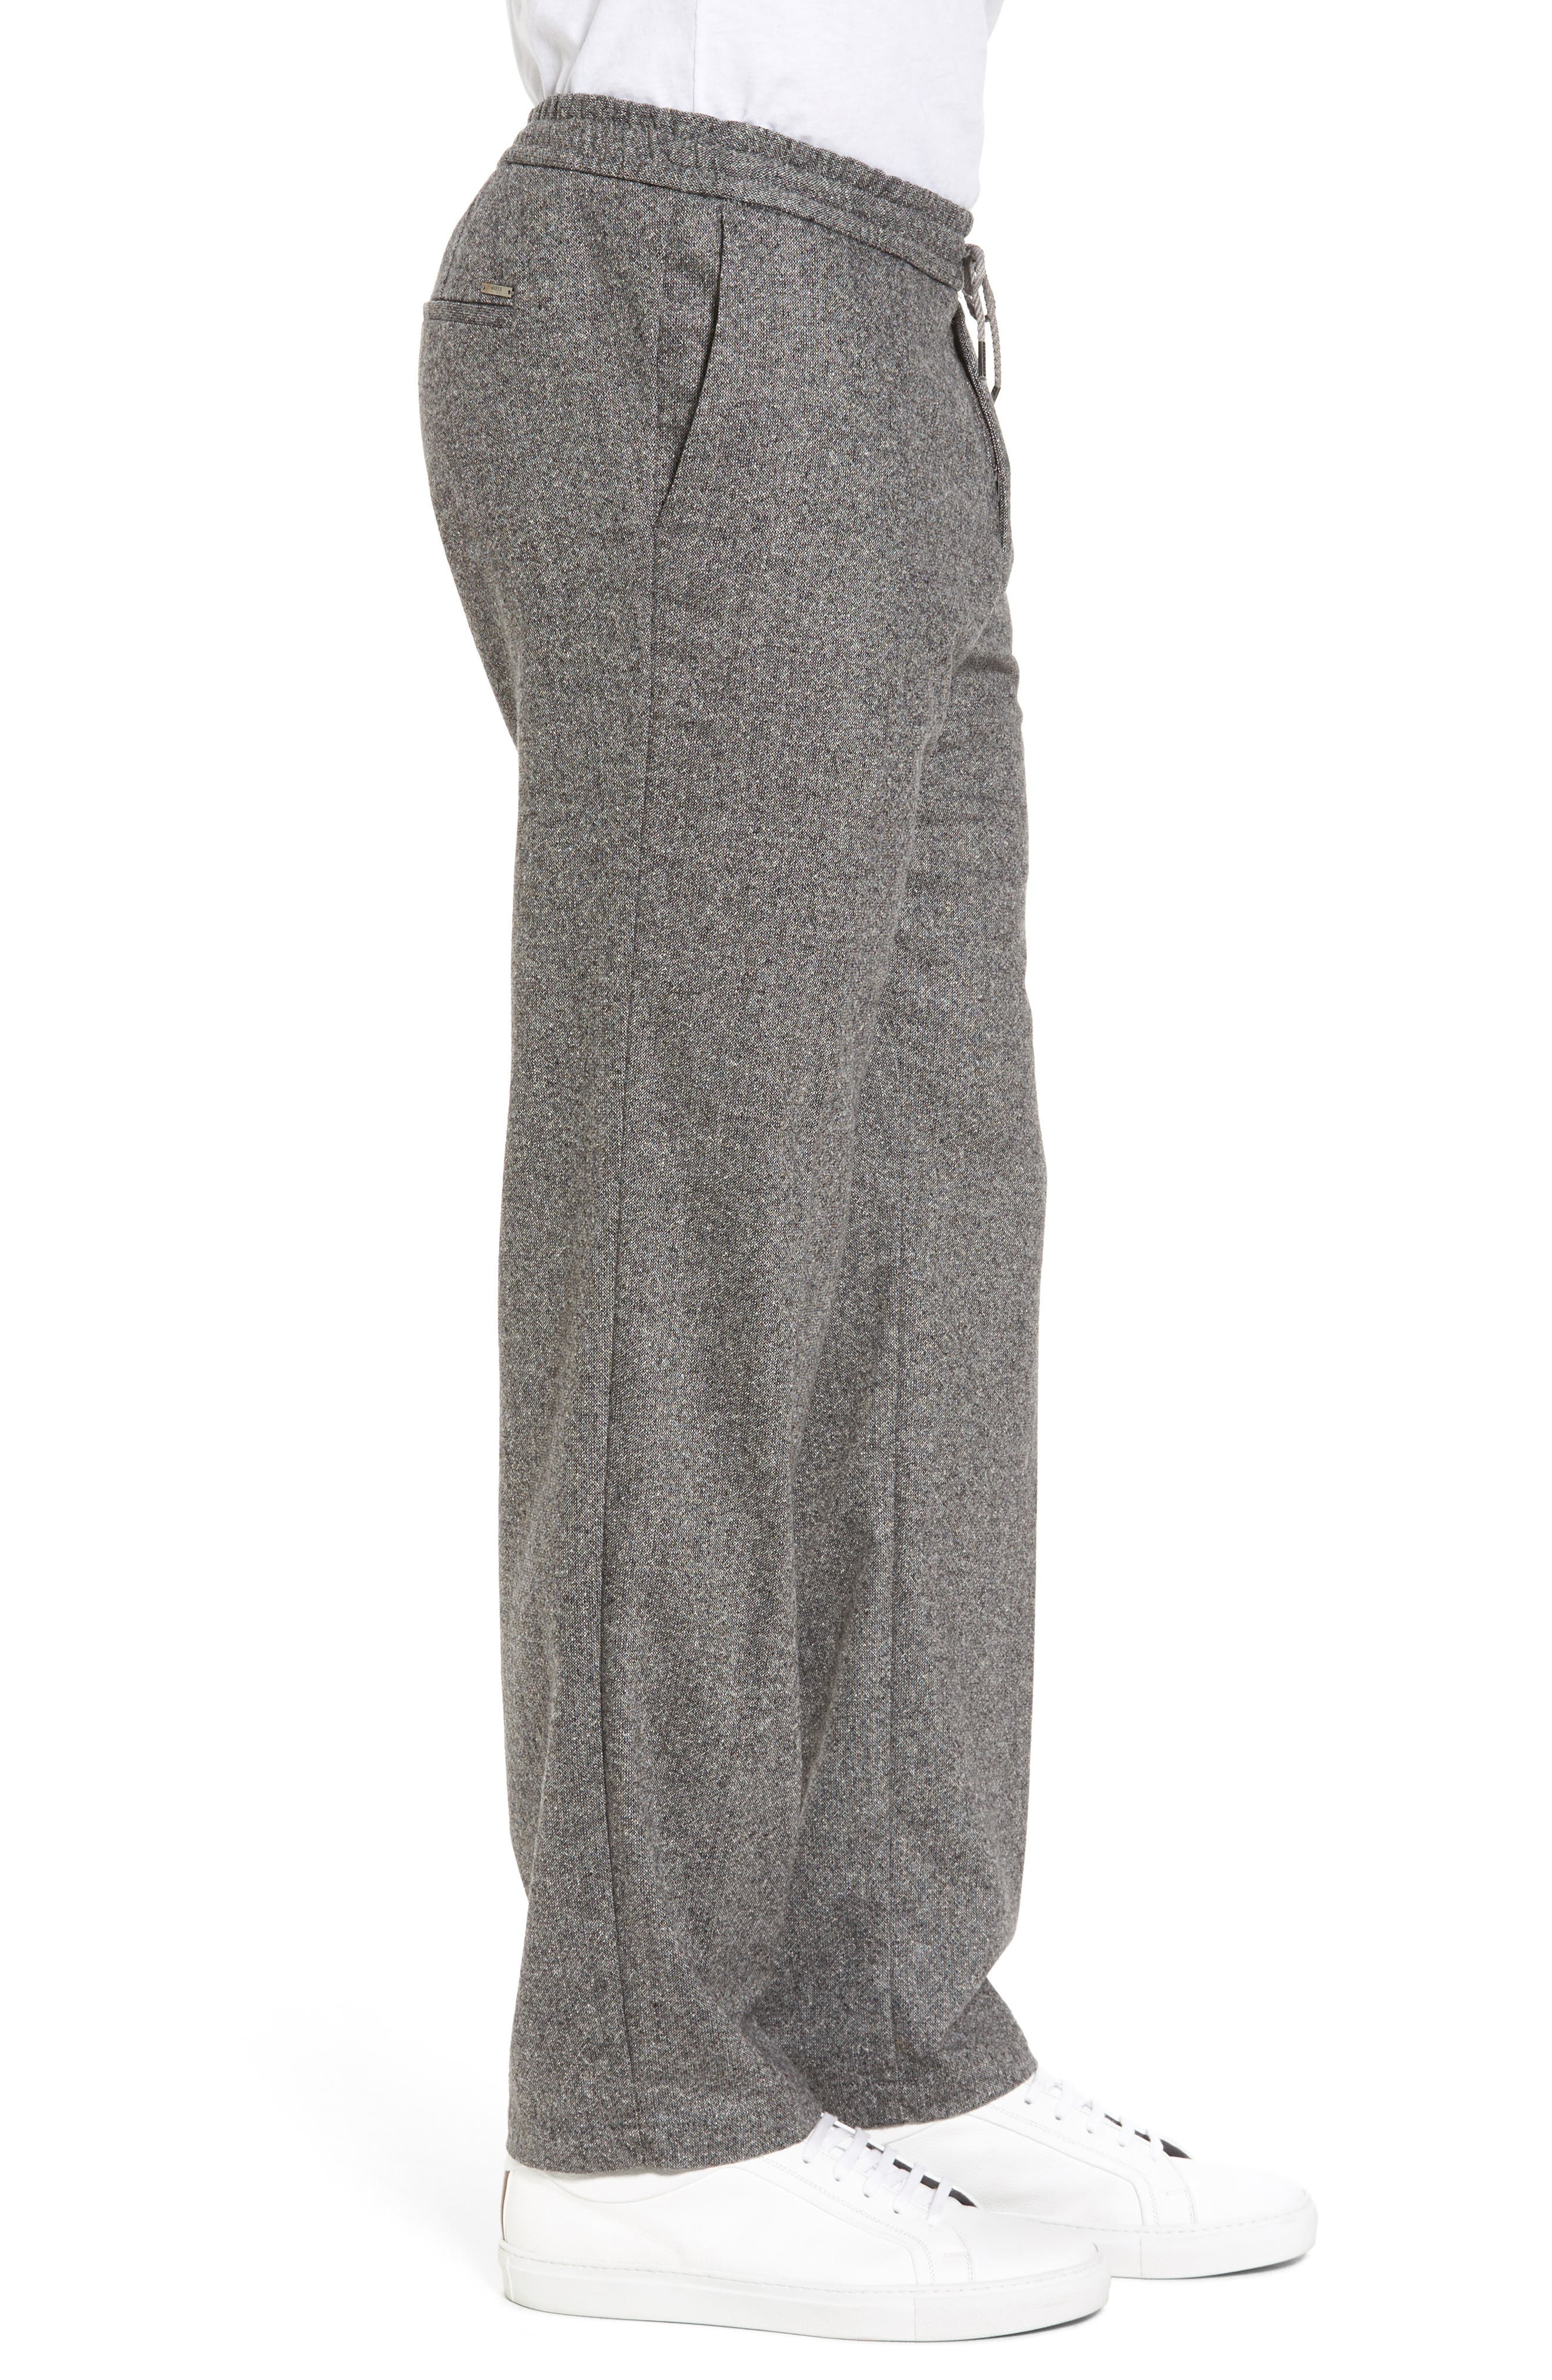 Barne Drawstring Waist Trousers,                             Alternate thumbnail 3, color,